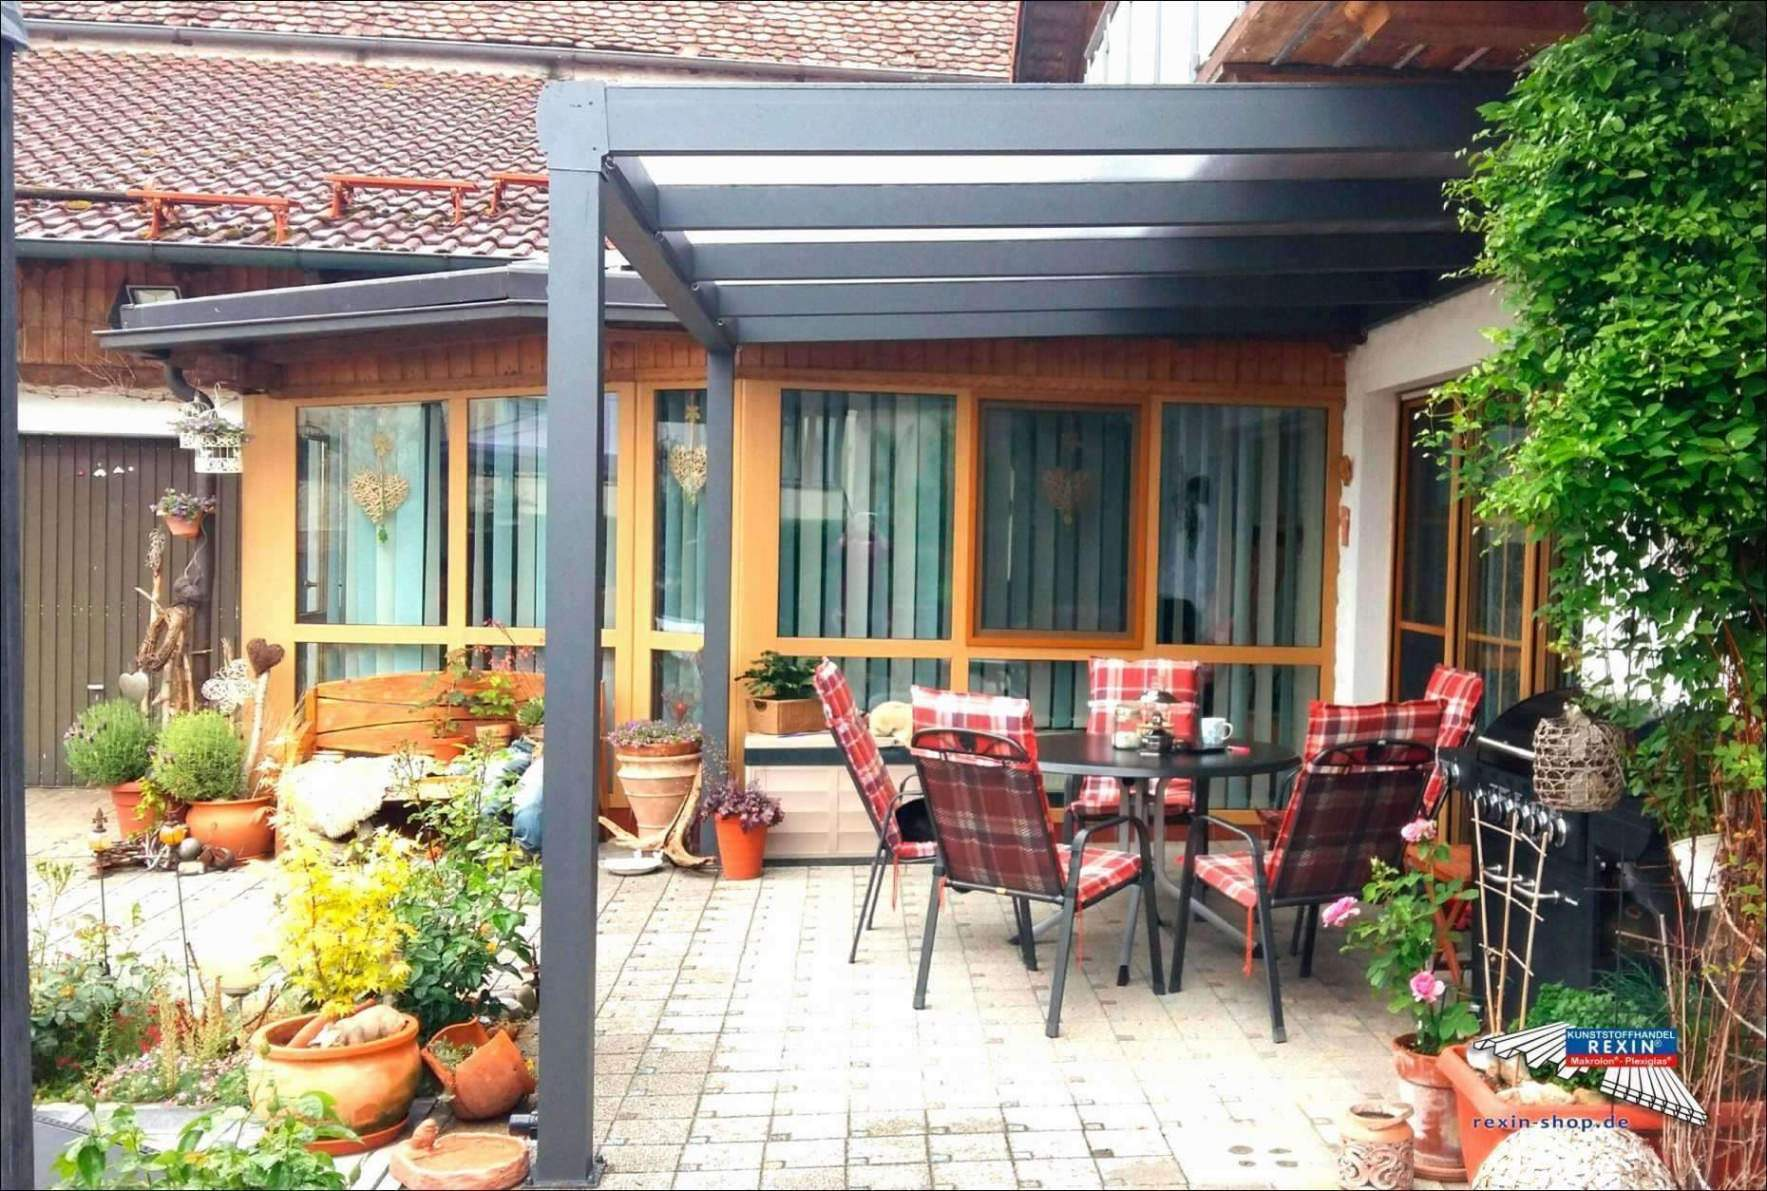 garten ideen selber bauen mit balkon garten ideen neu balkon aus holz selber bauen bildnis 21 und balkon garten ideen neu balkon aus holz selber bauen bildnis garten balkon zu machen balkon zu machen